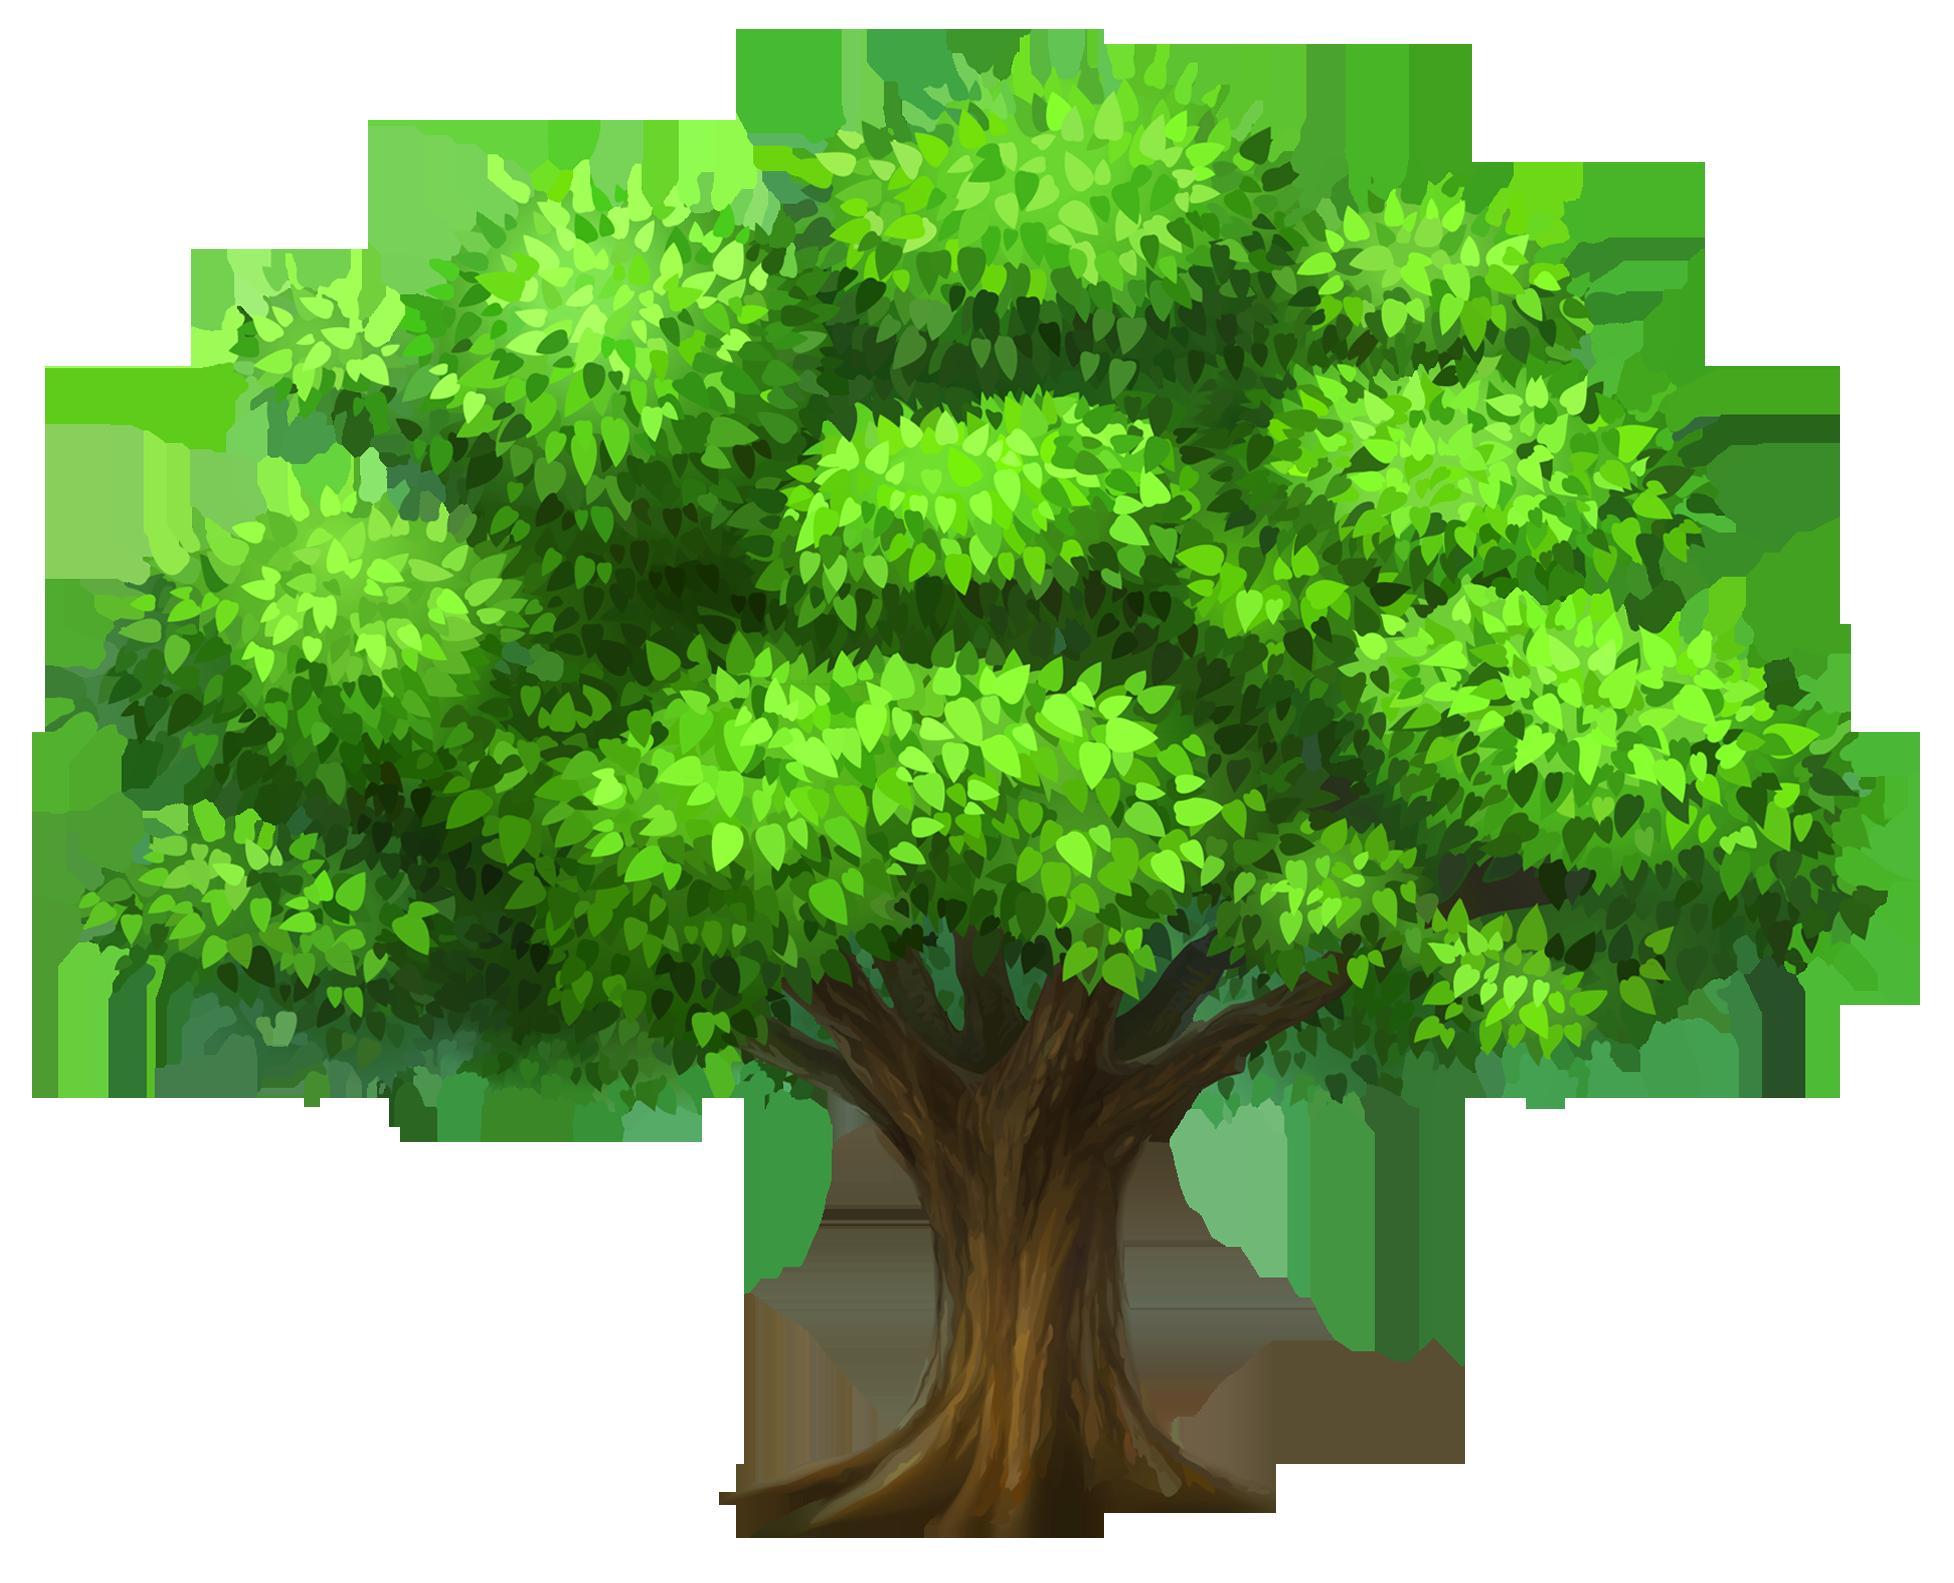 Cartoon oak tree clipart image stock Oak tree tree clipart clipart   landscapes   Tree clipart, Tree ... image stock